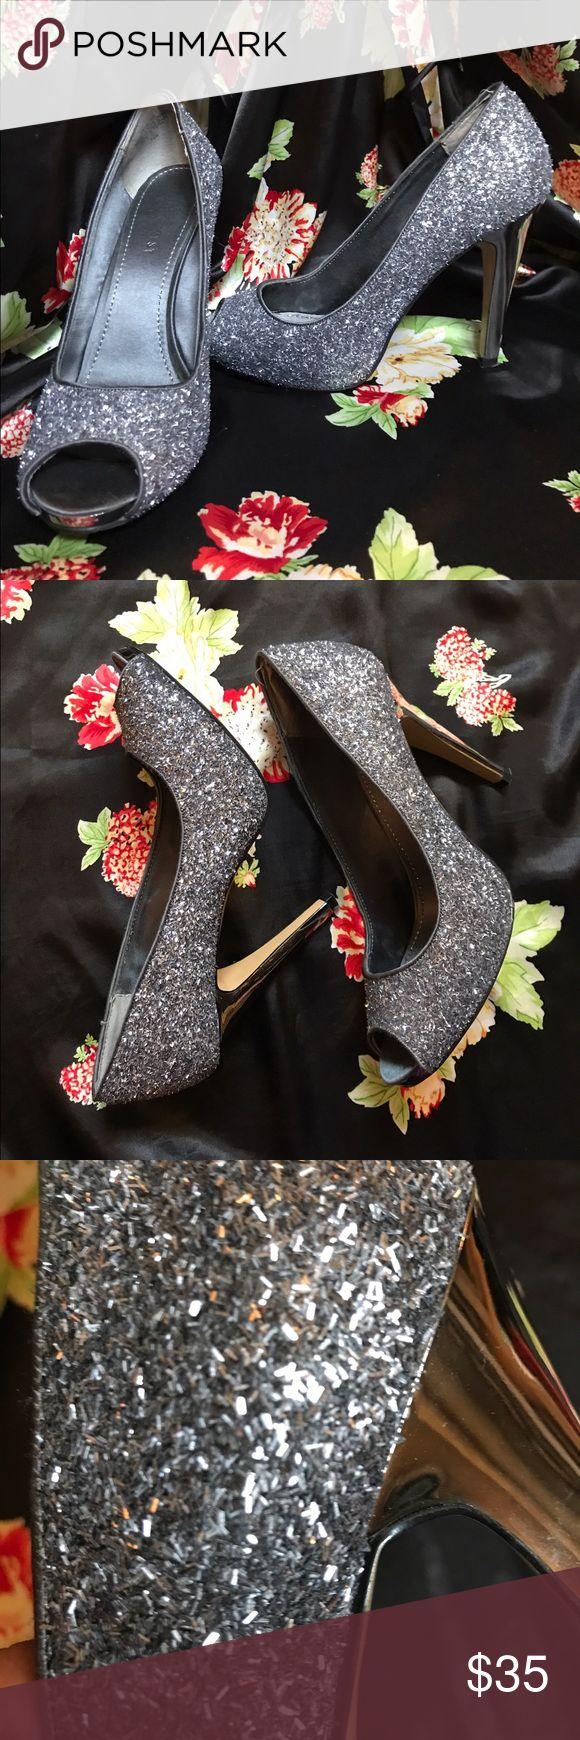 Nine West 🎉✨✨ heels Nine West ✨✨ heels. Size 7.5 this is a heel you party in! 😉 shoe has confetti texture 🎉🎉 Nine West Shoes Heels